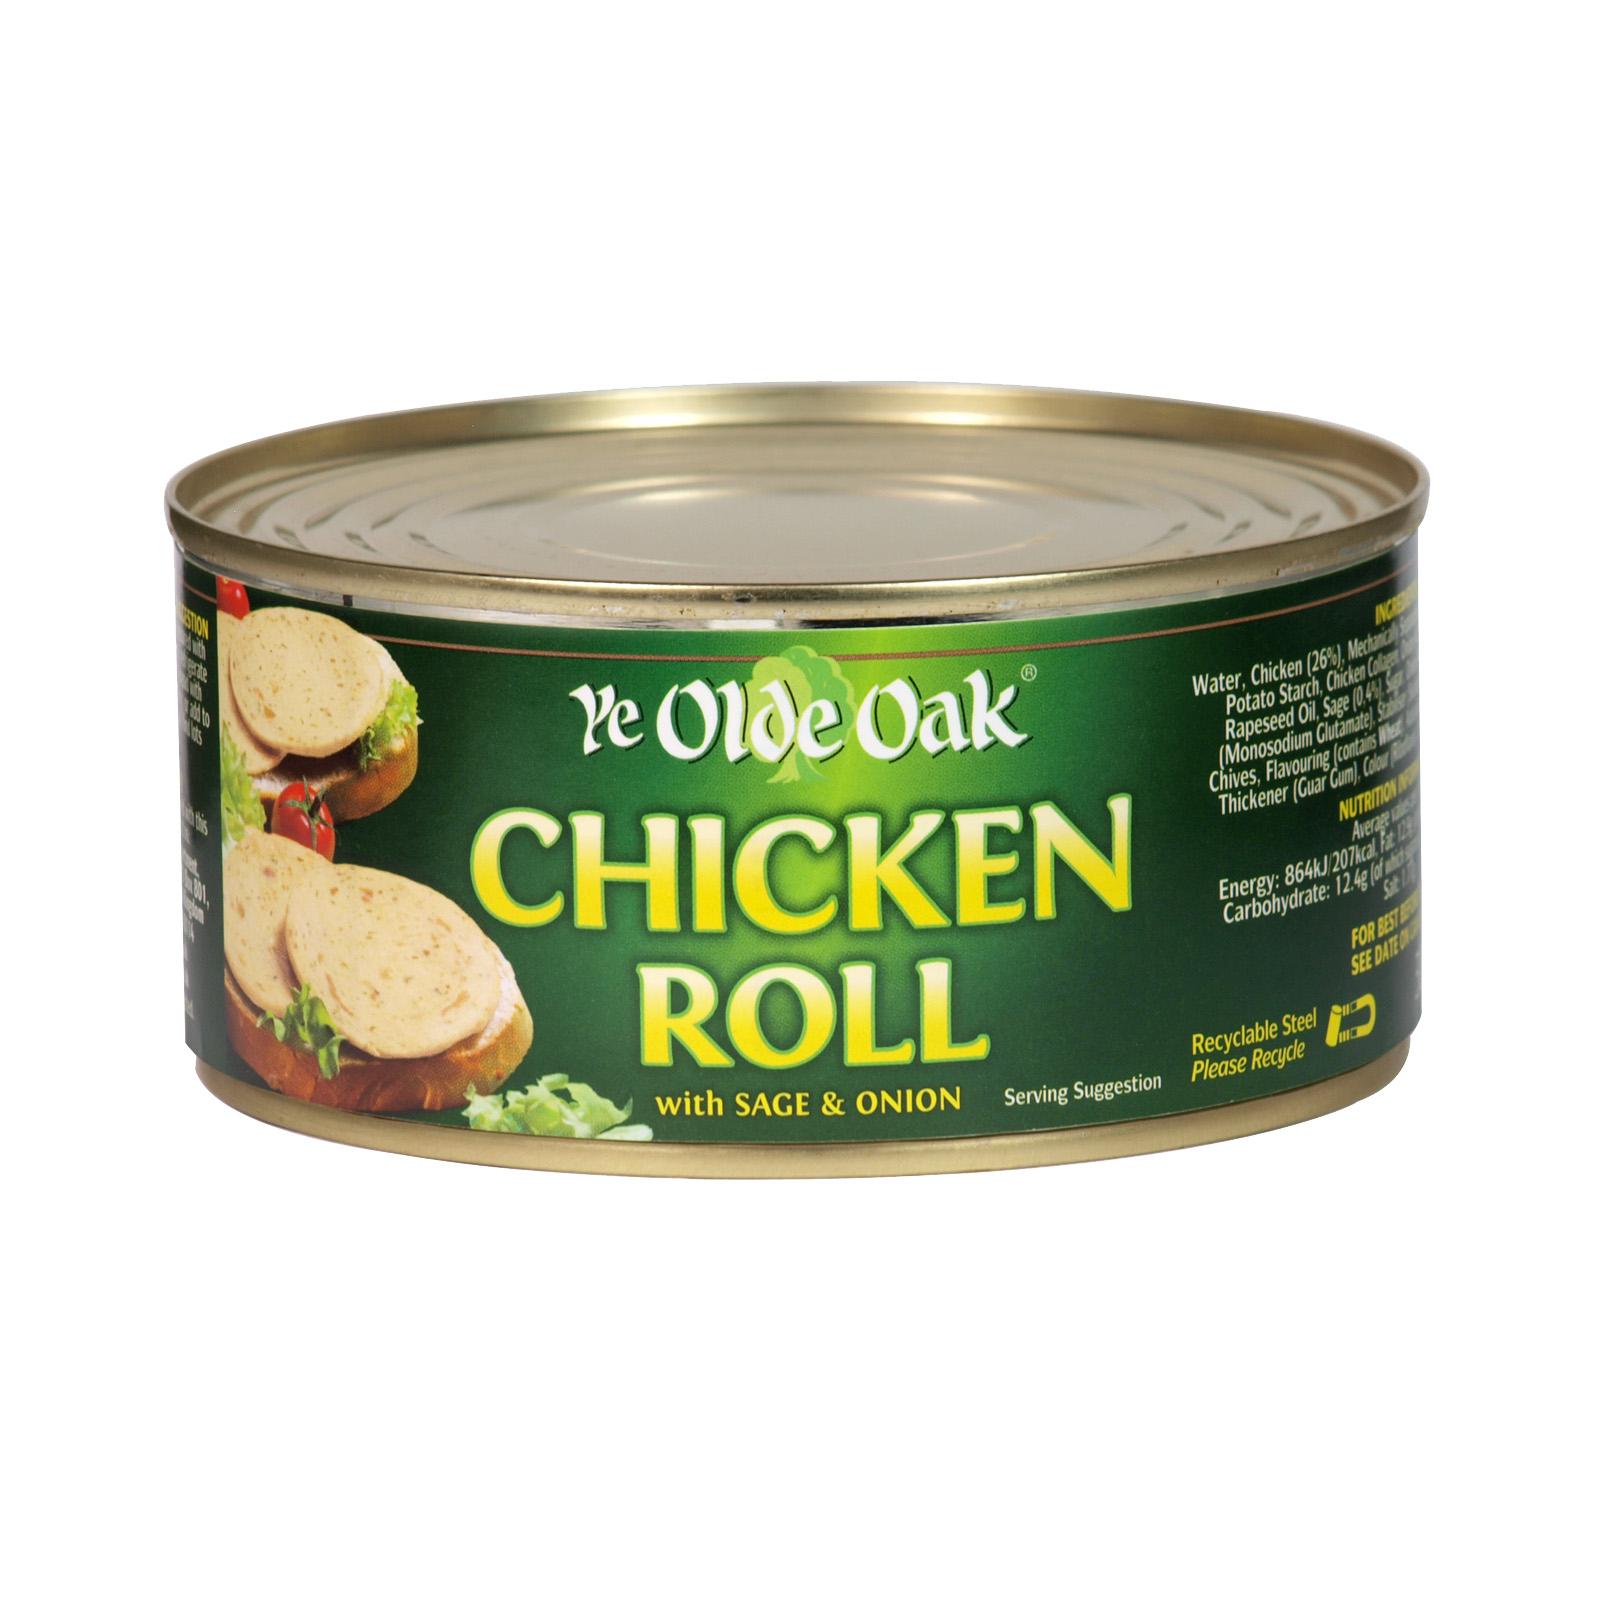 Ye olde oak chicken roll 29p at FarmFoods Little hulton Manchester